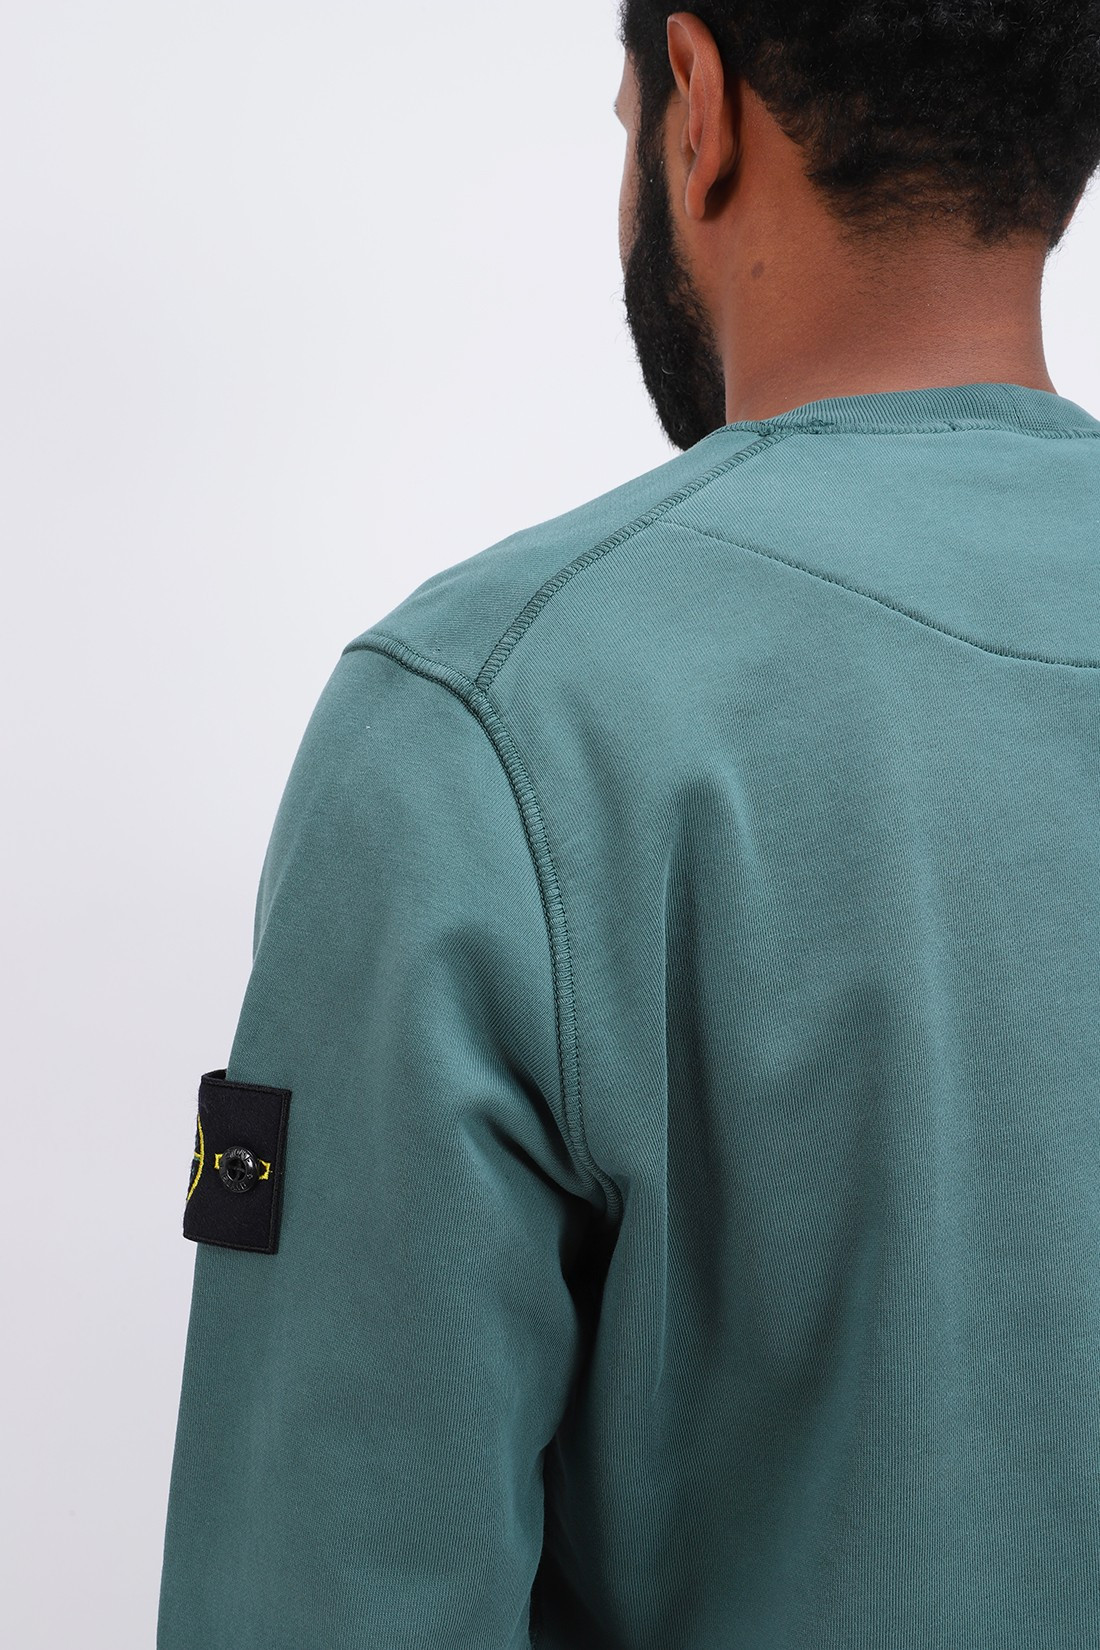 STONE ISLAND / 63051 crewneck sweater v0057 Petrolio